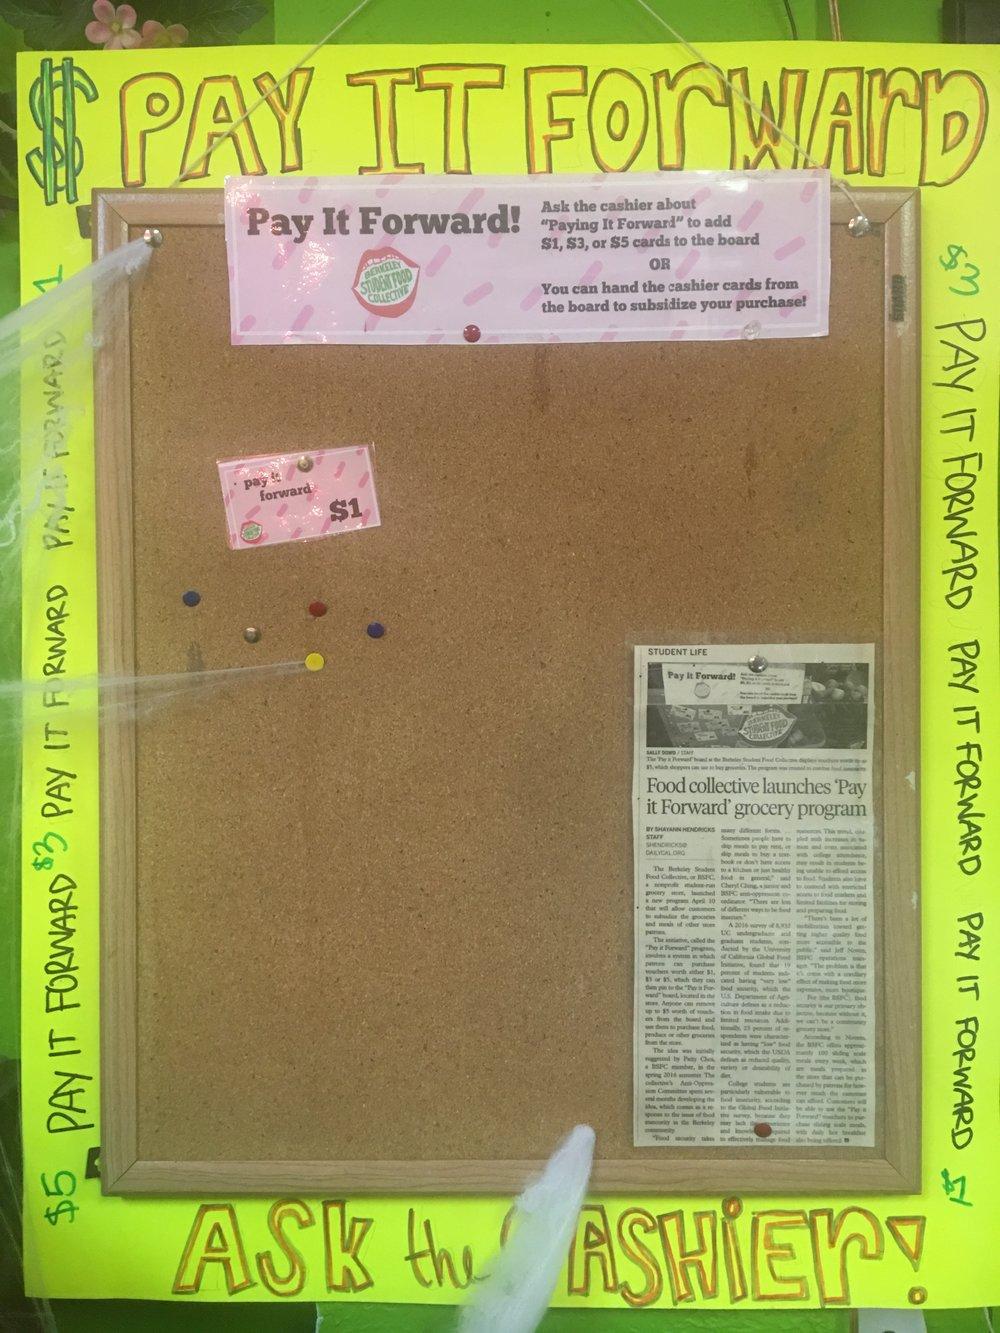 payitforward.JPG